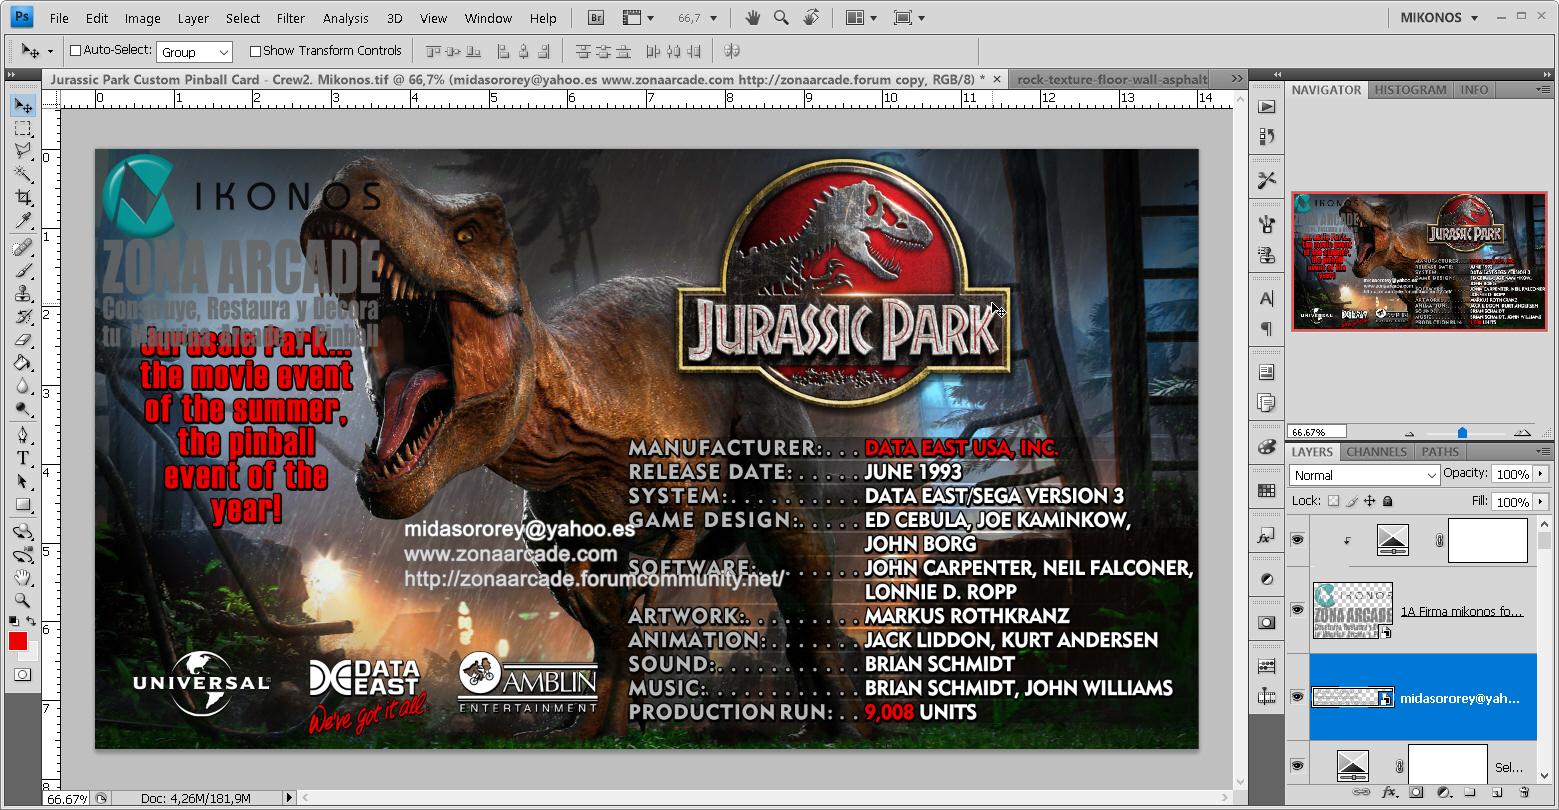 Jurassic%20Park%20Custom%20Pinball%20Card%20-%20Crew.%20Mikonos1.jpg